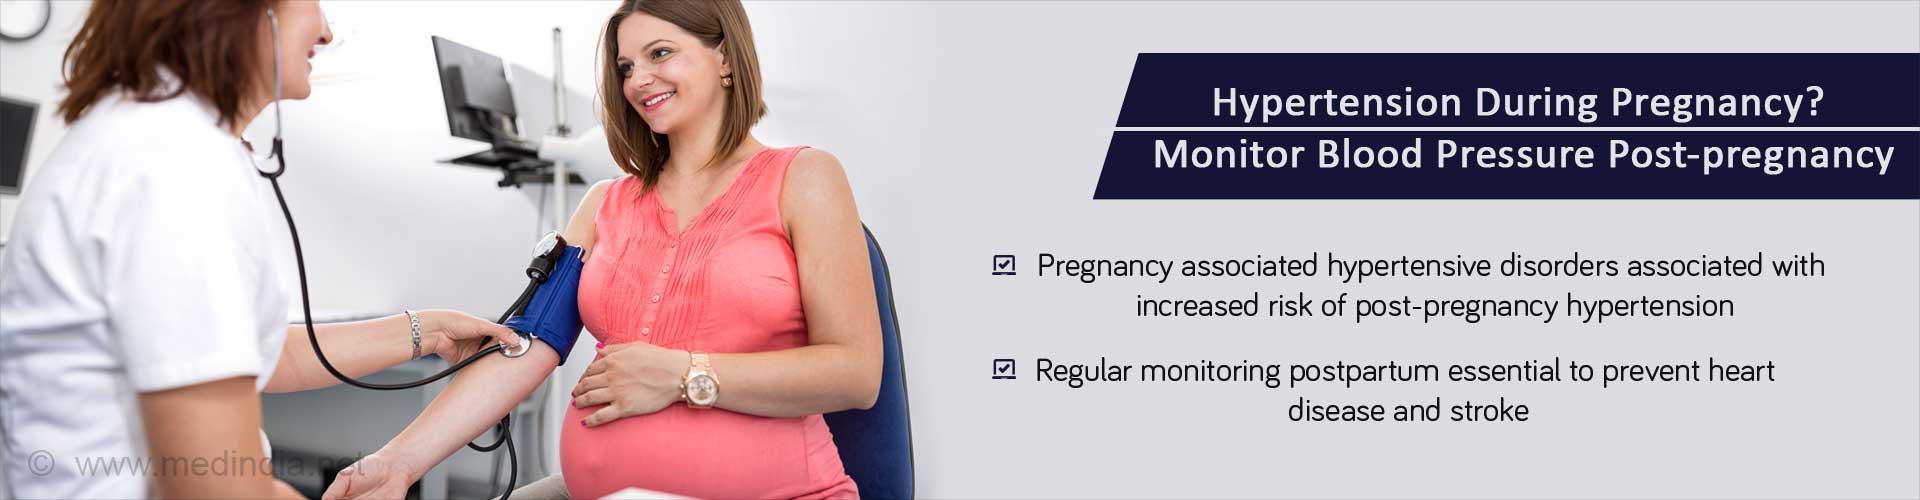 Pregnancy-induced Hypertension Increases Risk of Post-pregnancy Hypertension